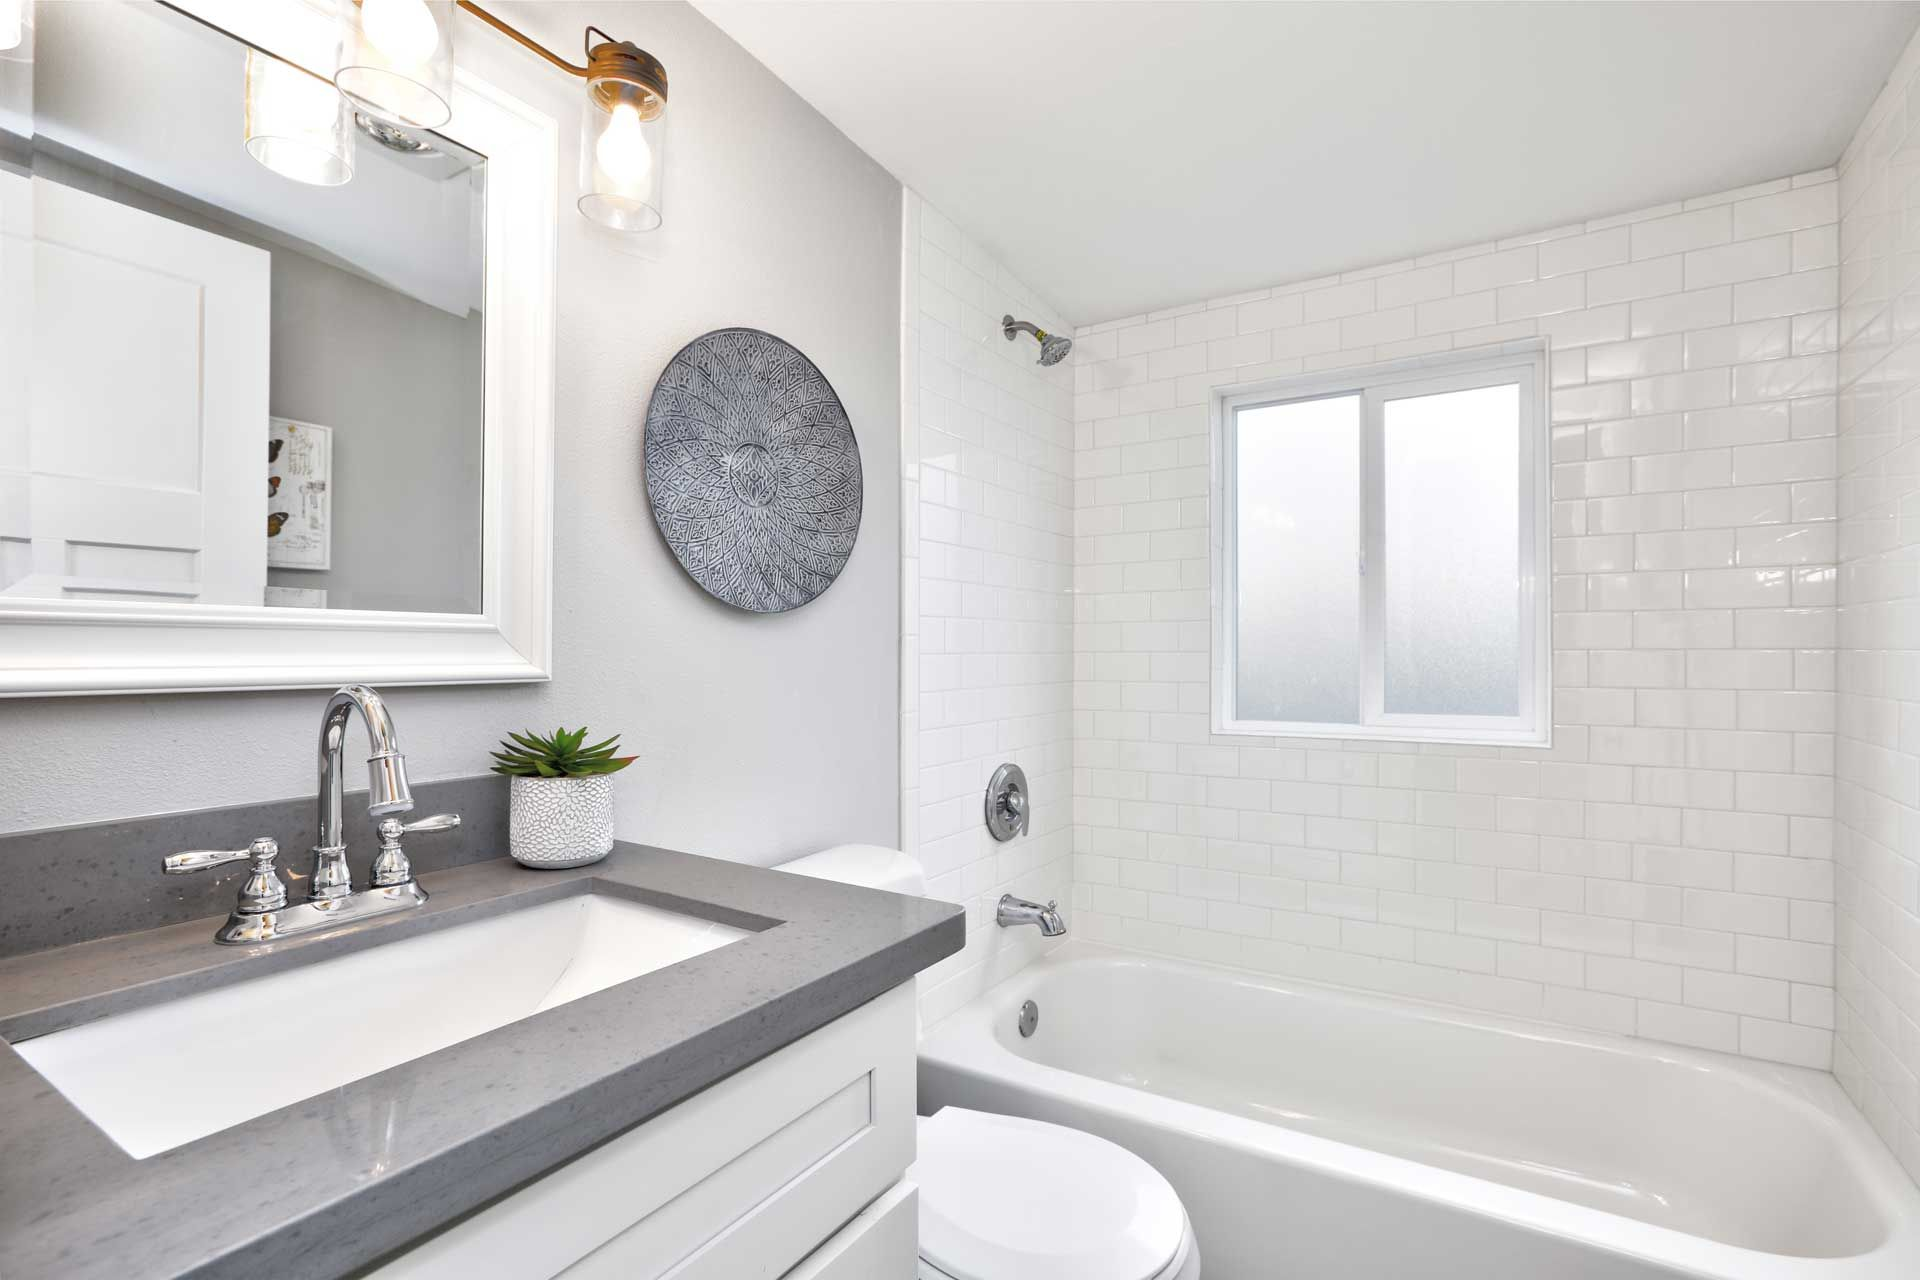 Bathroom Renovations | Philip Marry Heating & Plumbing ...